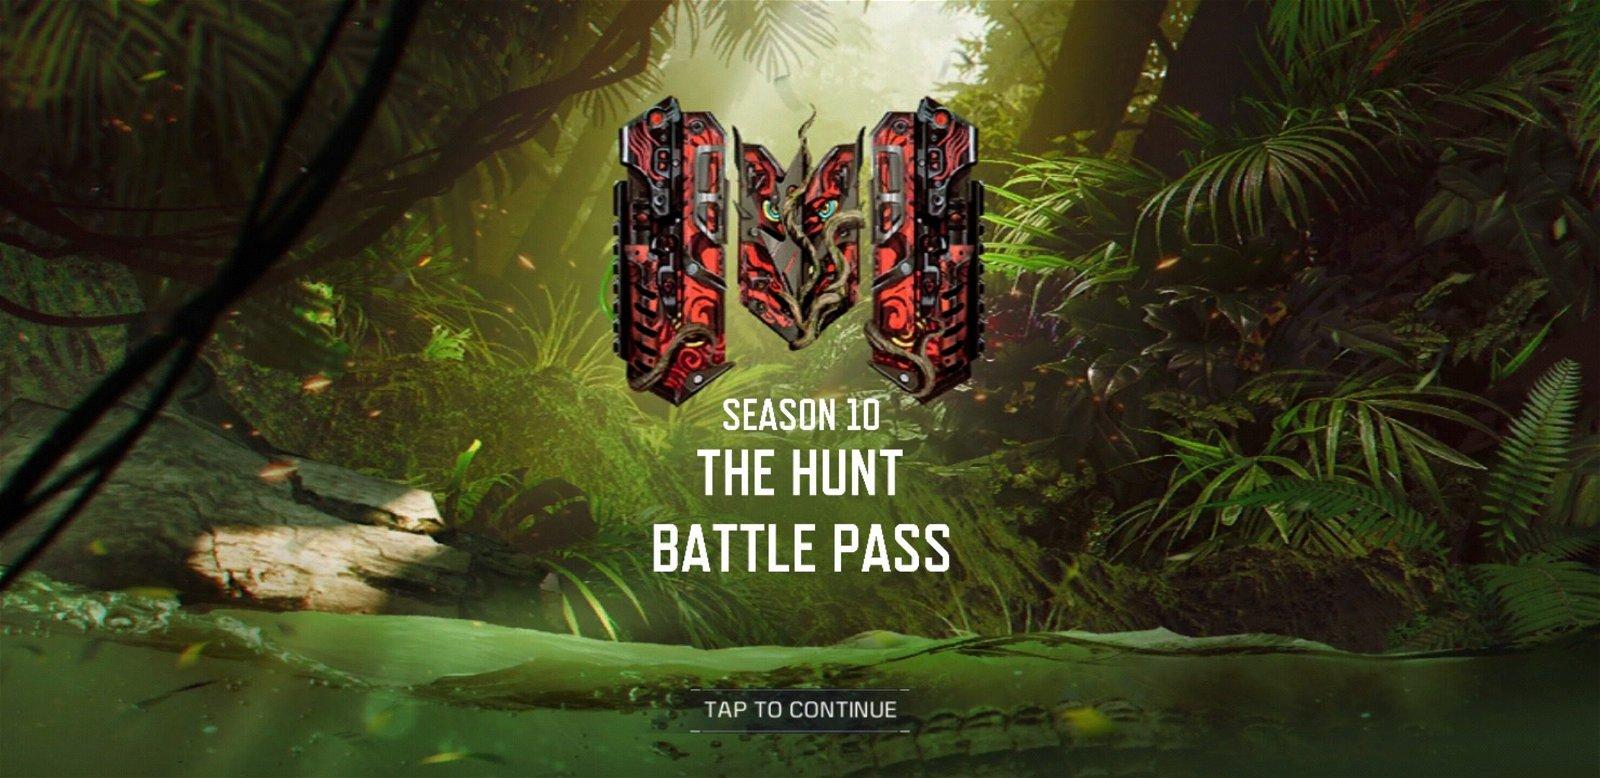 COD Mobile Season 10 Battle Pass